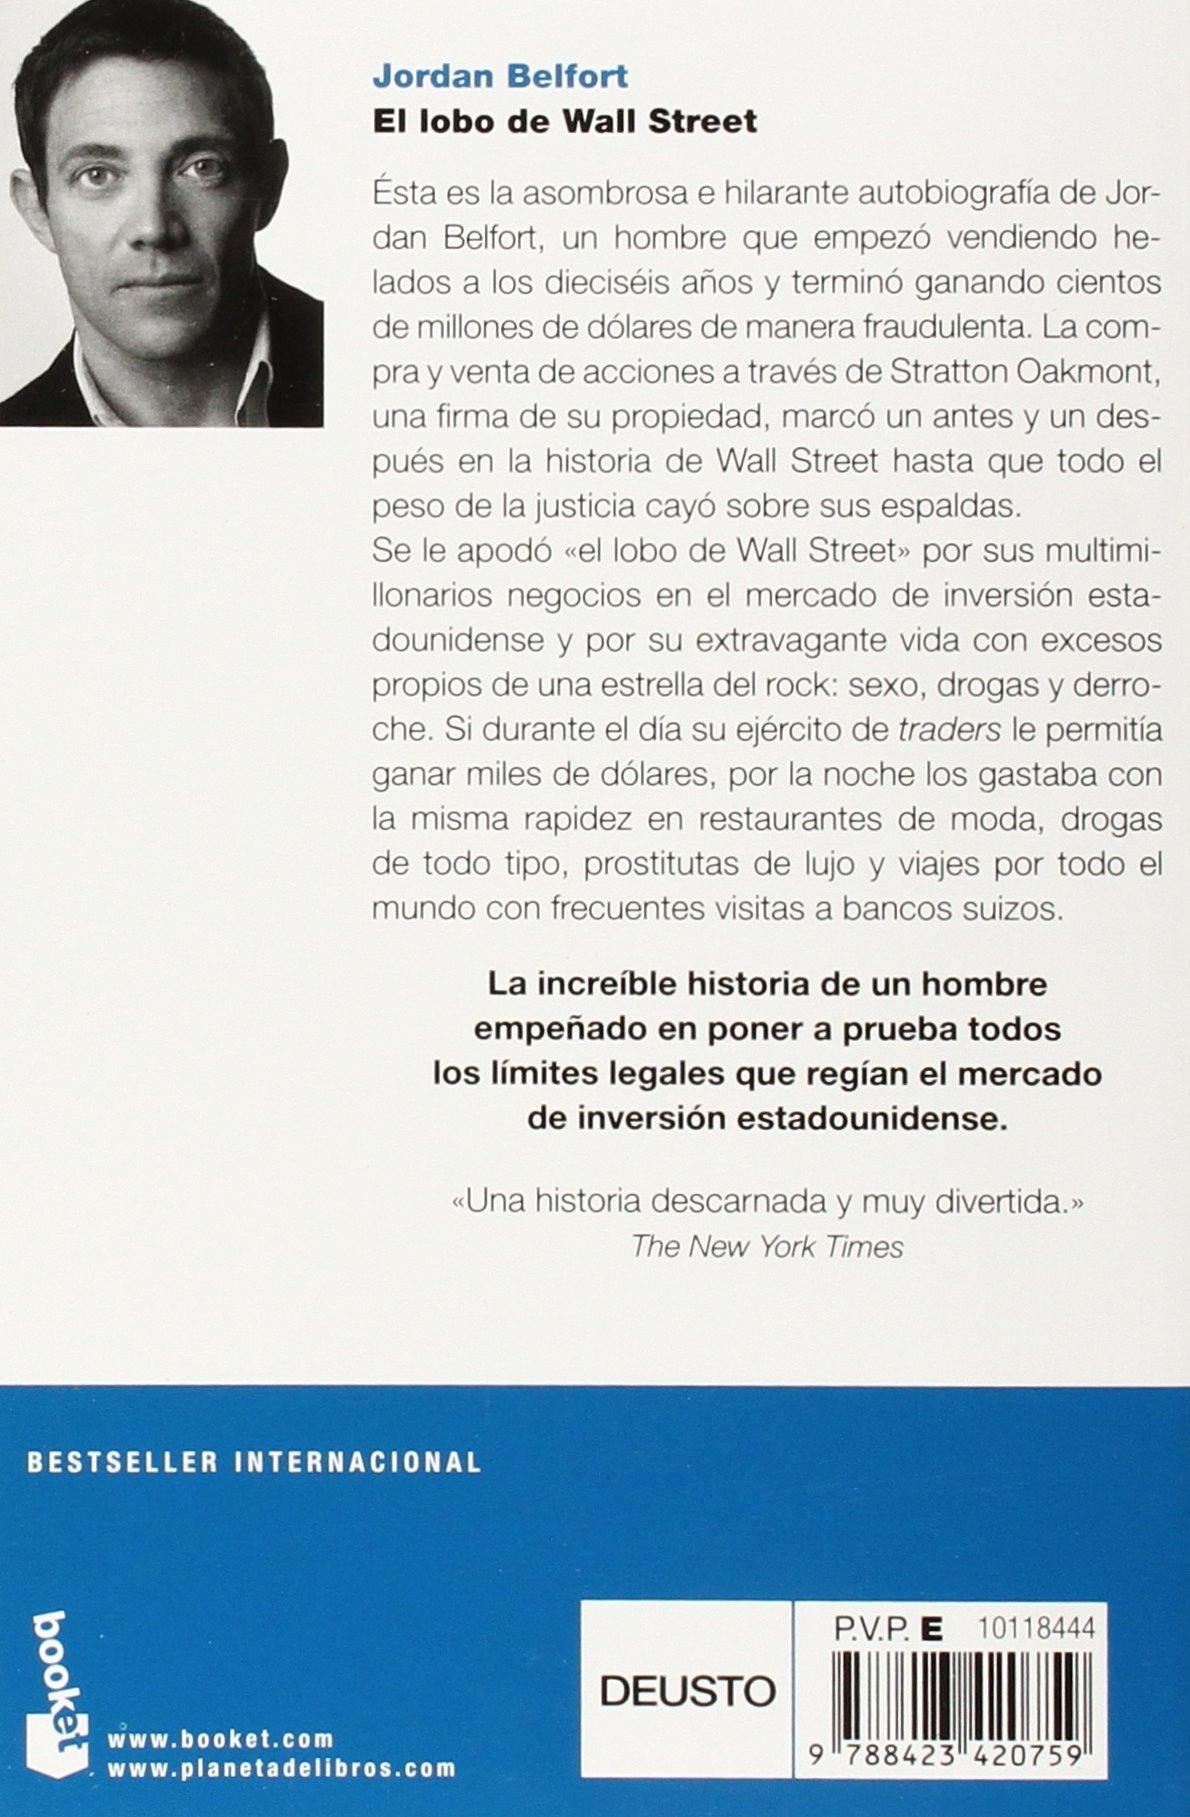 jordan belfort libro  El lobo de Wall Street: : Jordan Belfort: Libri in altre lingue